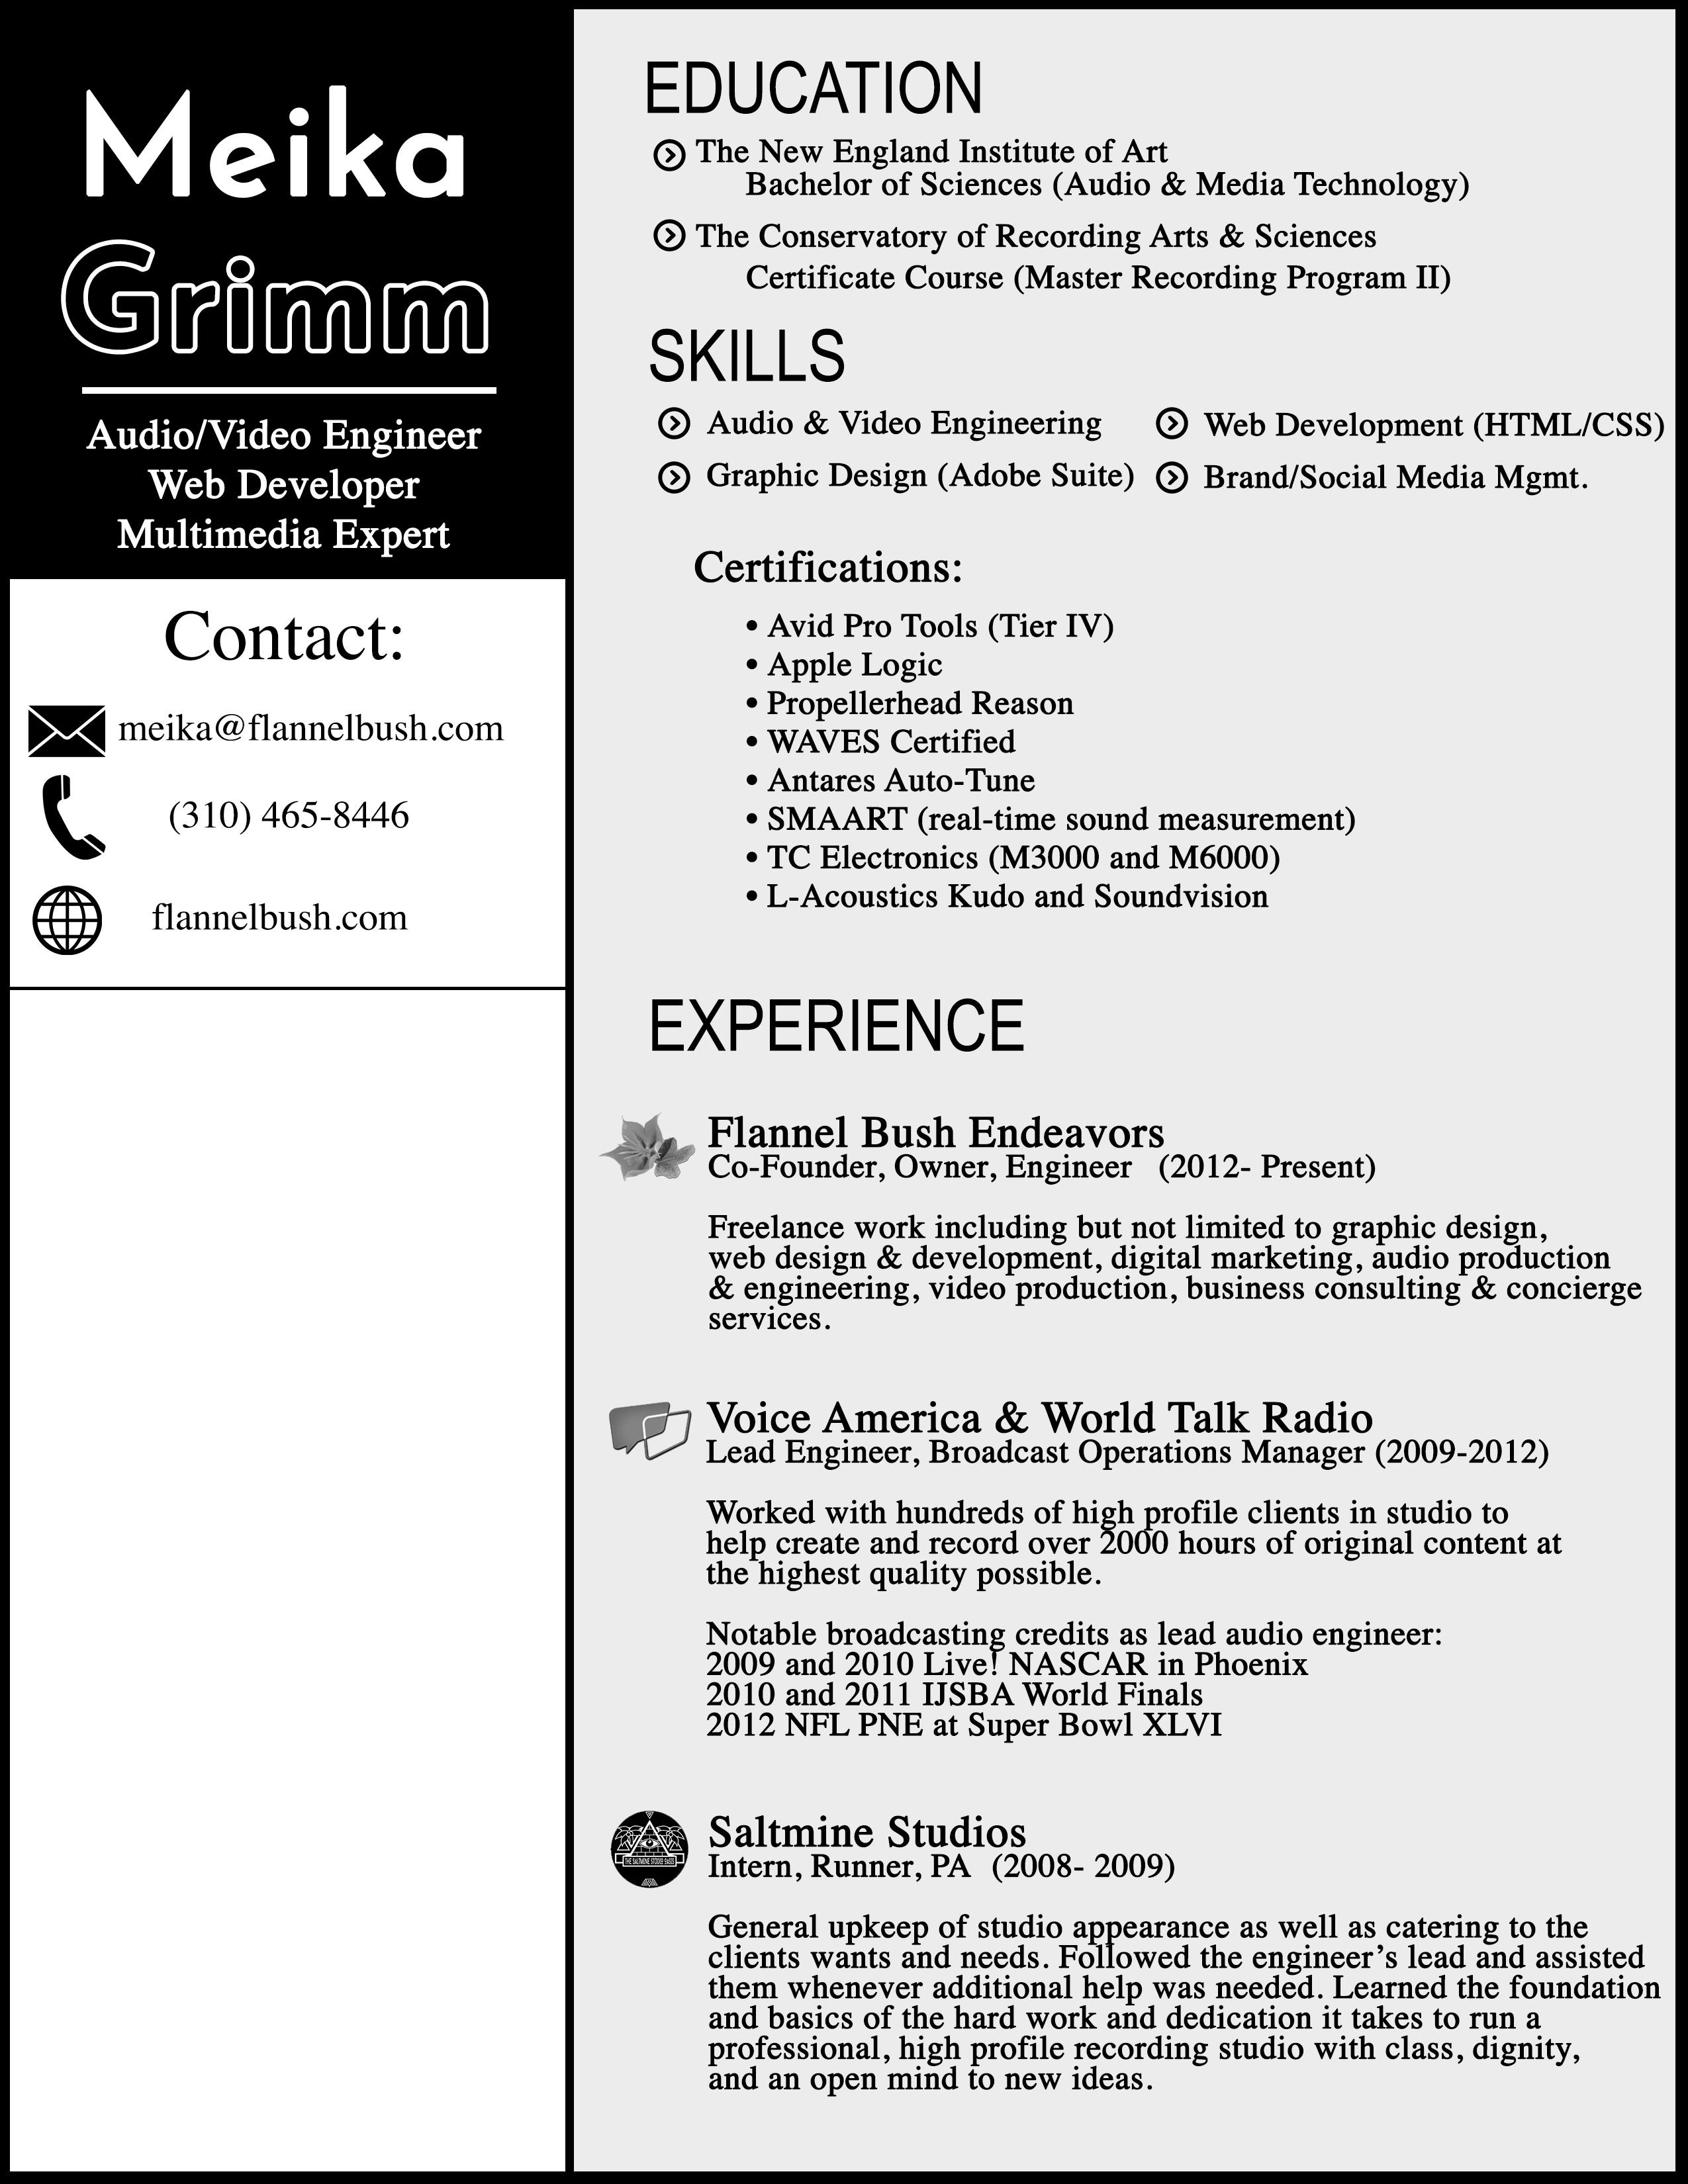 Resume | Meika Grimm